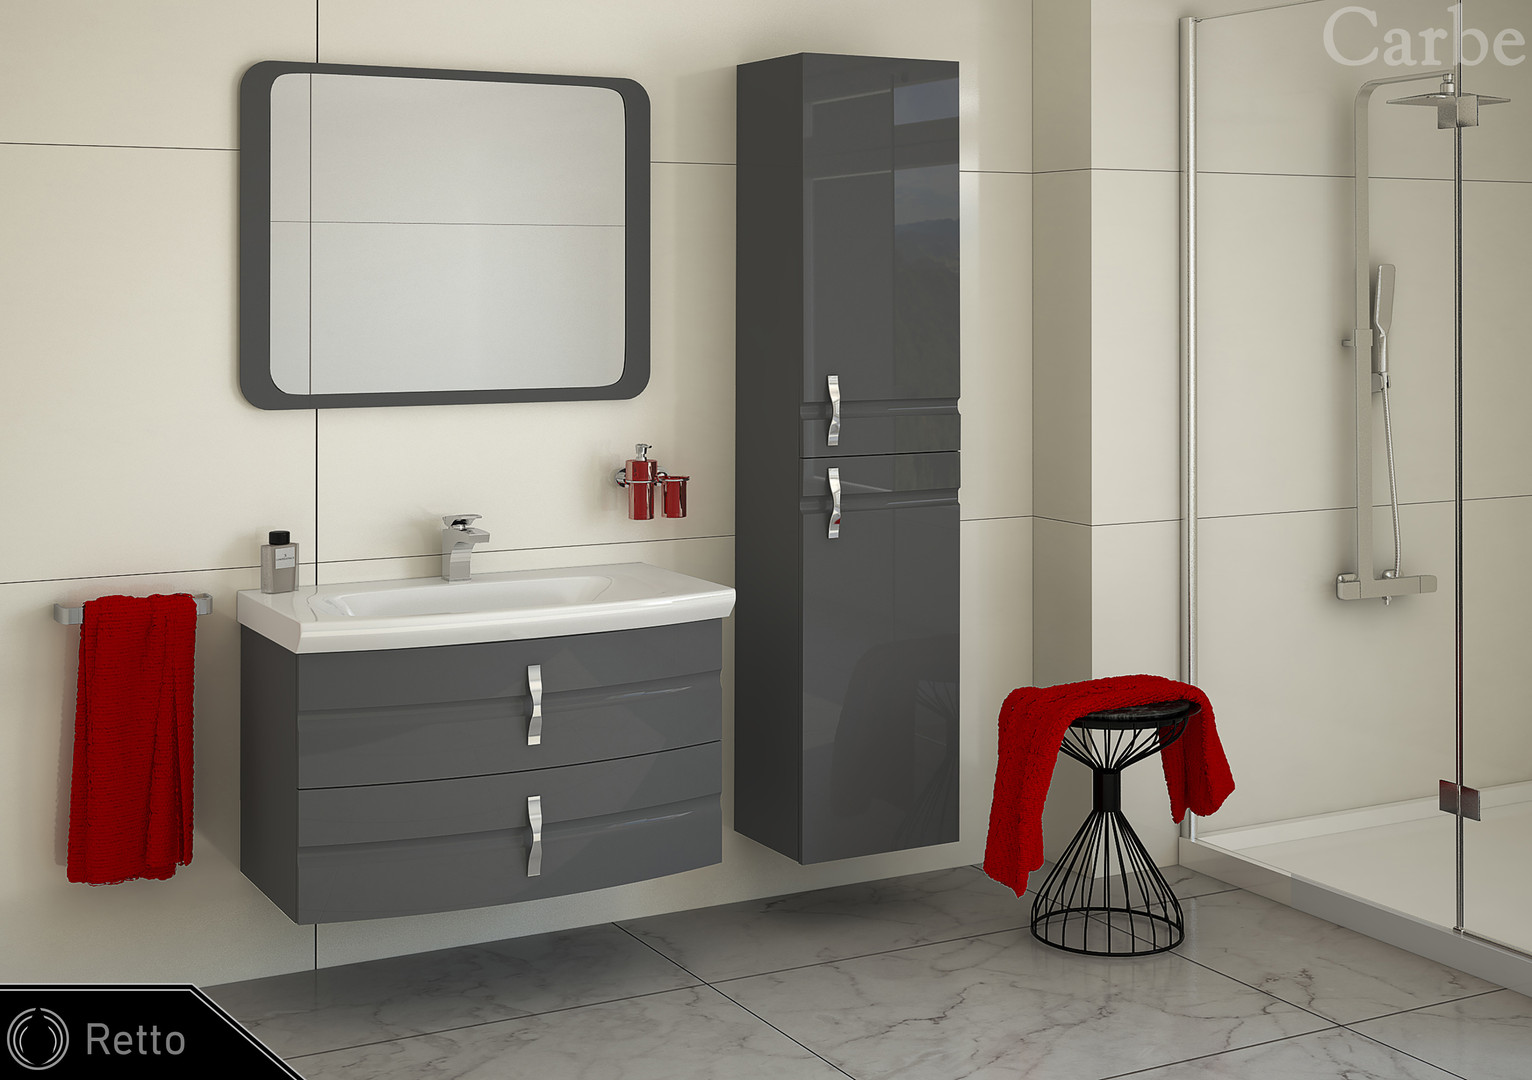 Retto - Agave High Gloss, Ceramic Washbasin, Soft Closing